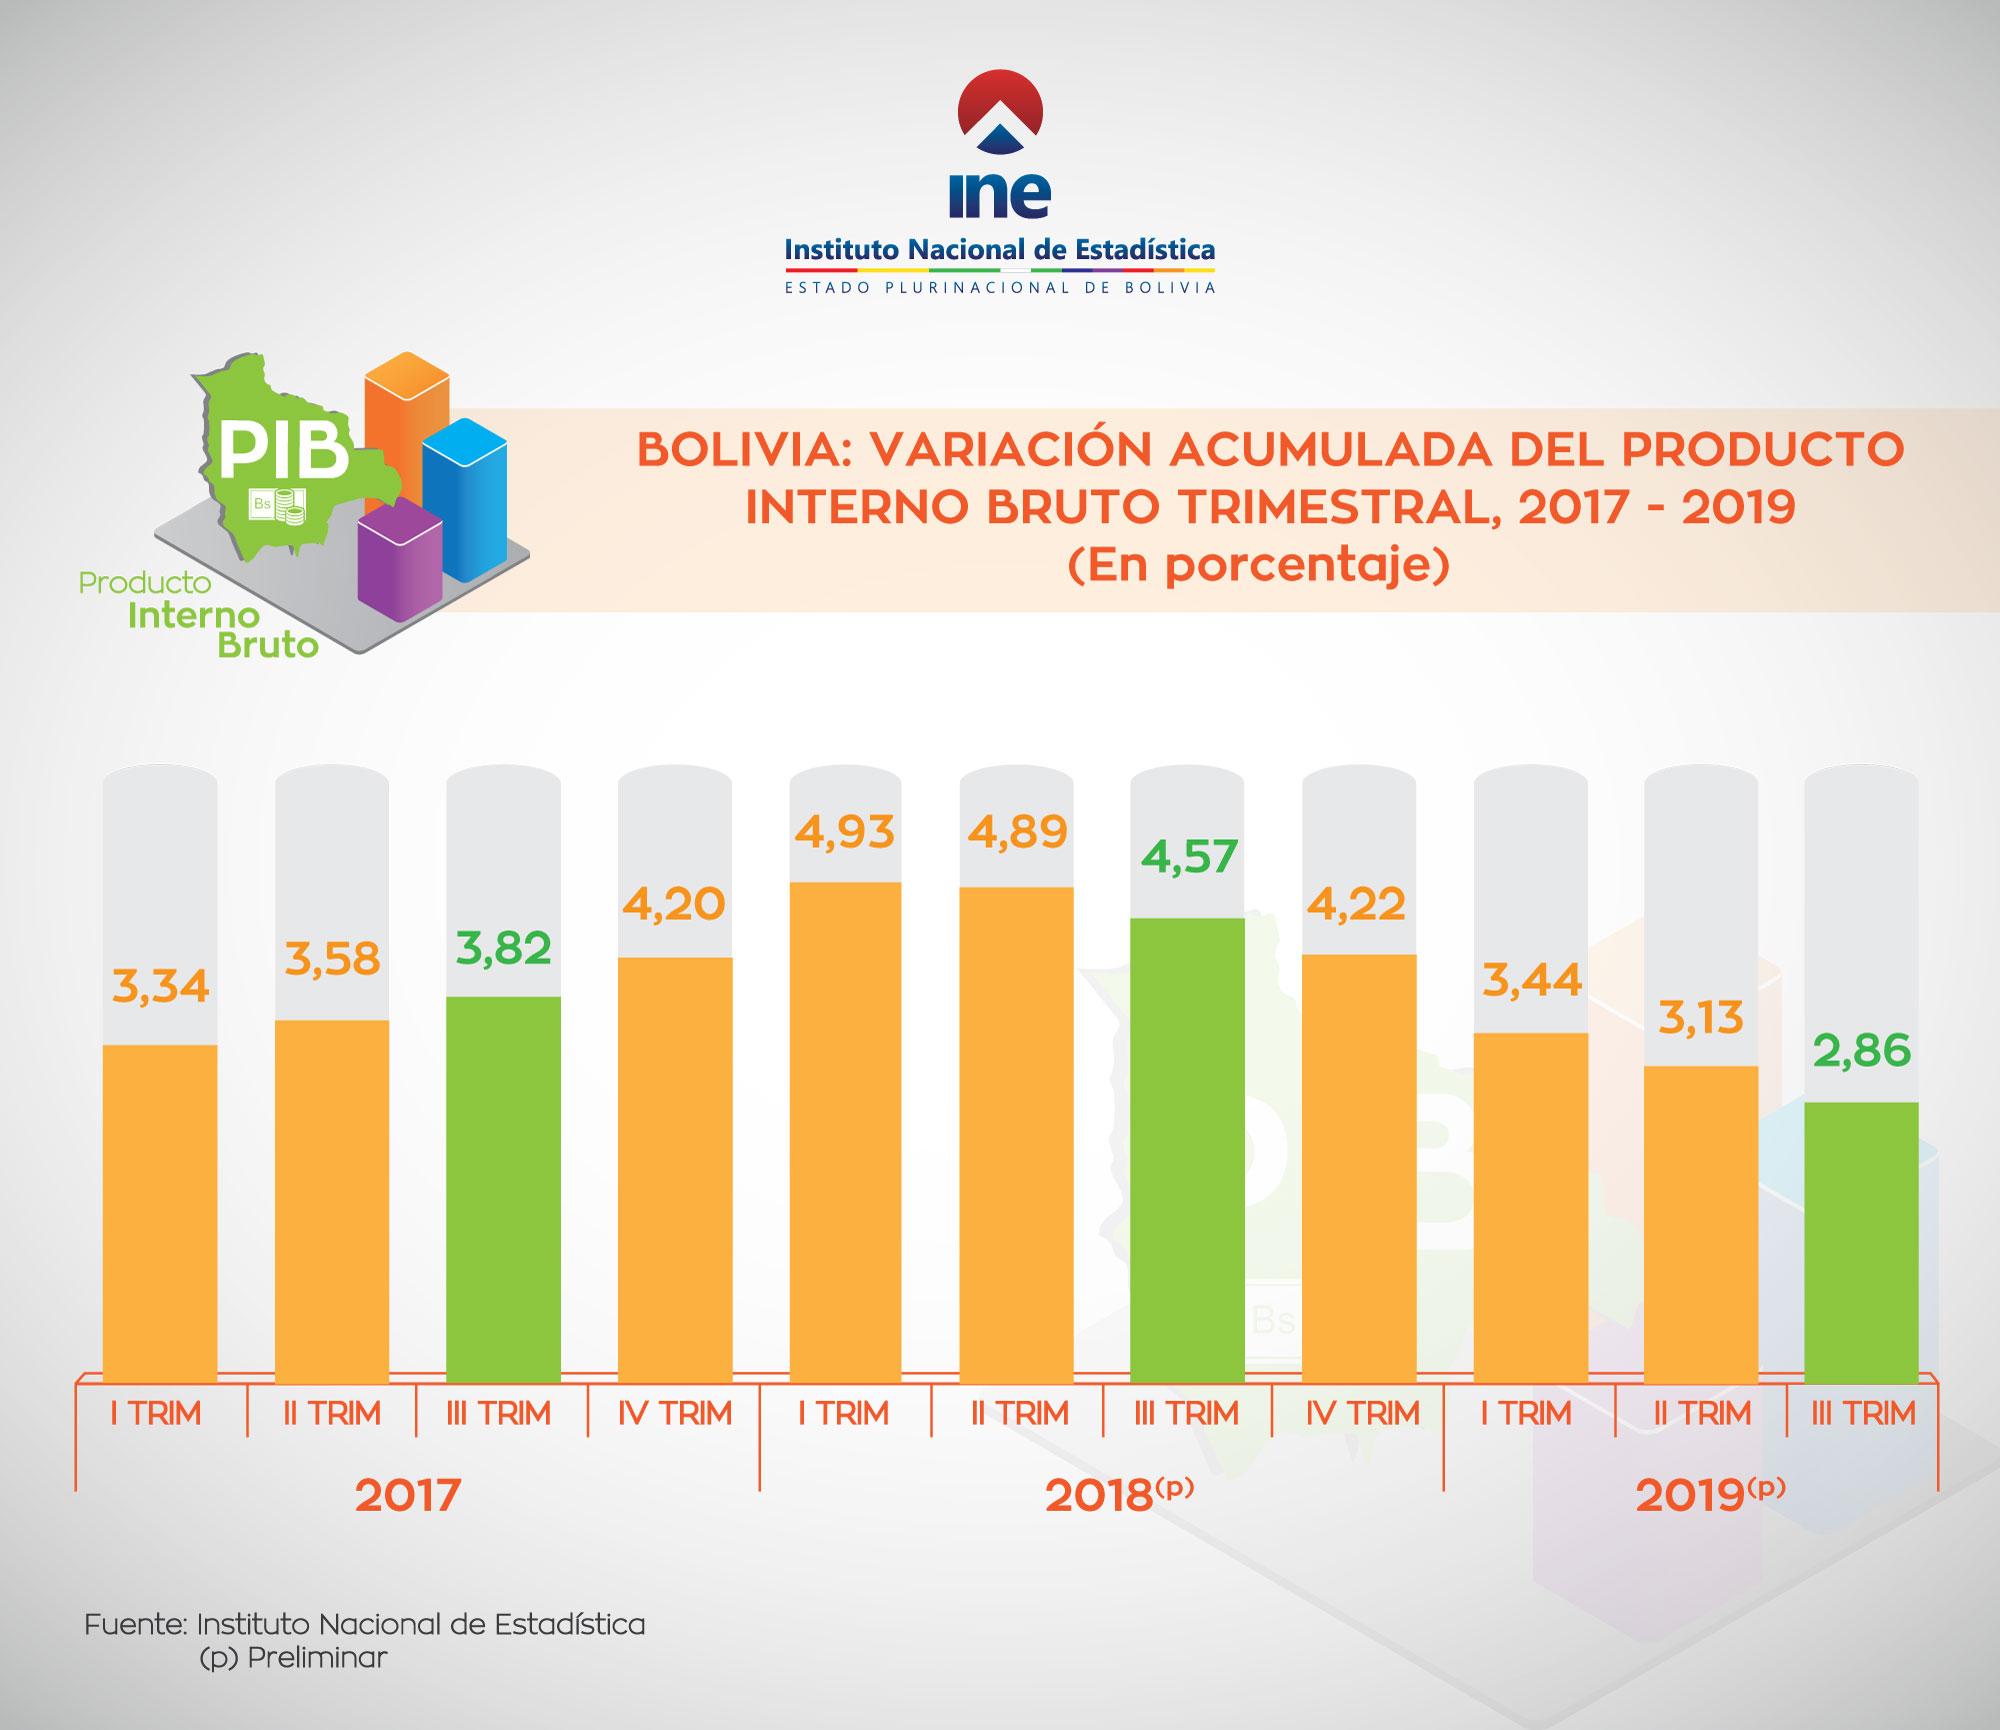 BOLIVIA: VARIACION ACUMULADA DEL PRIDUCTO INTERNO BRUTO TRIMESTRAL , 2017 - 2019